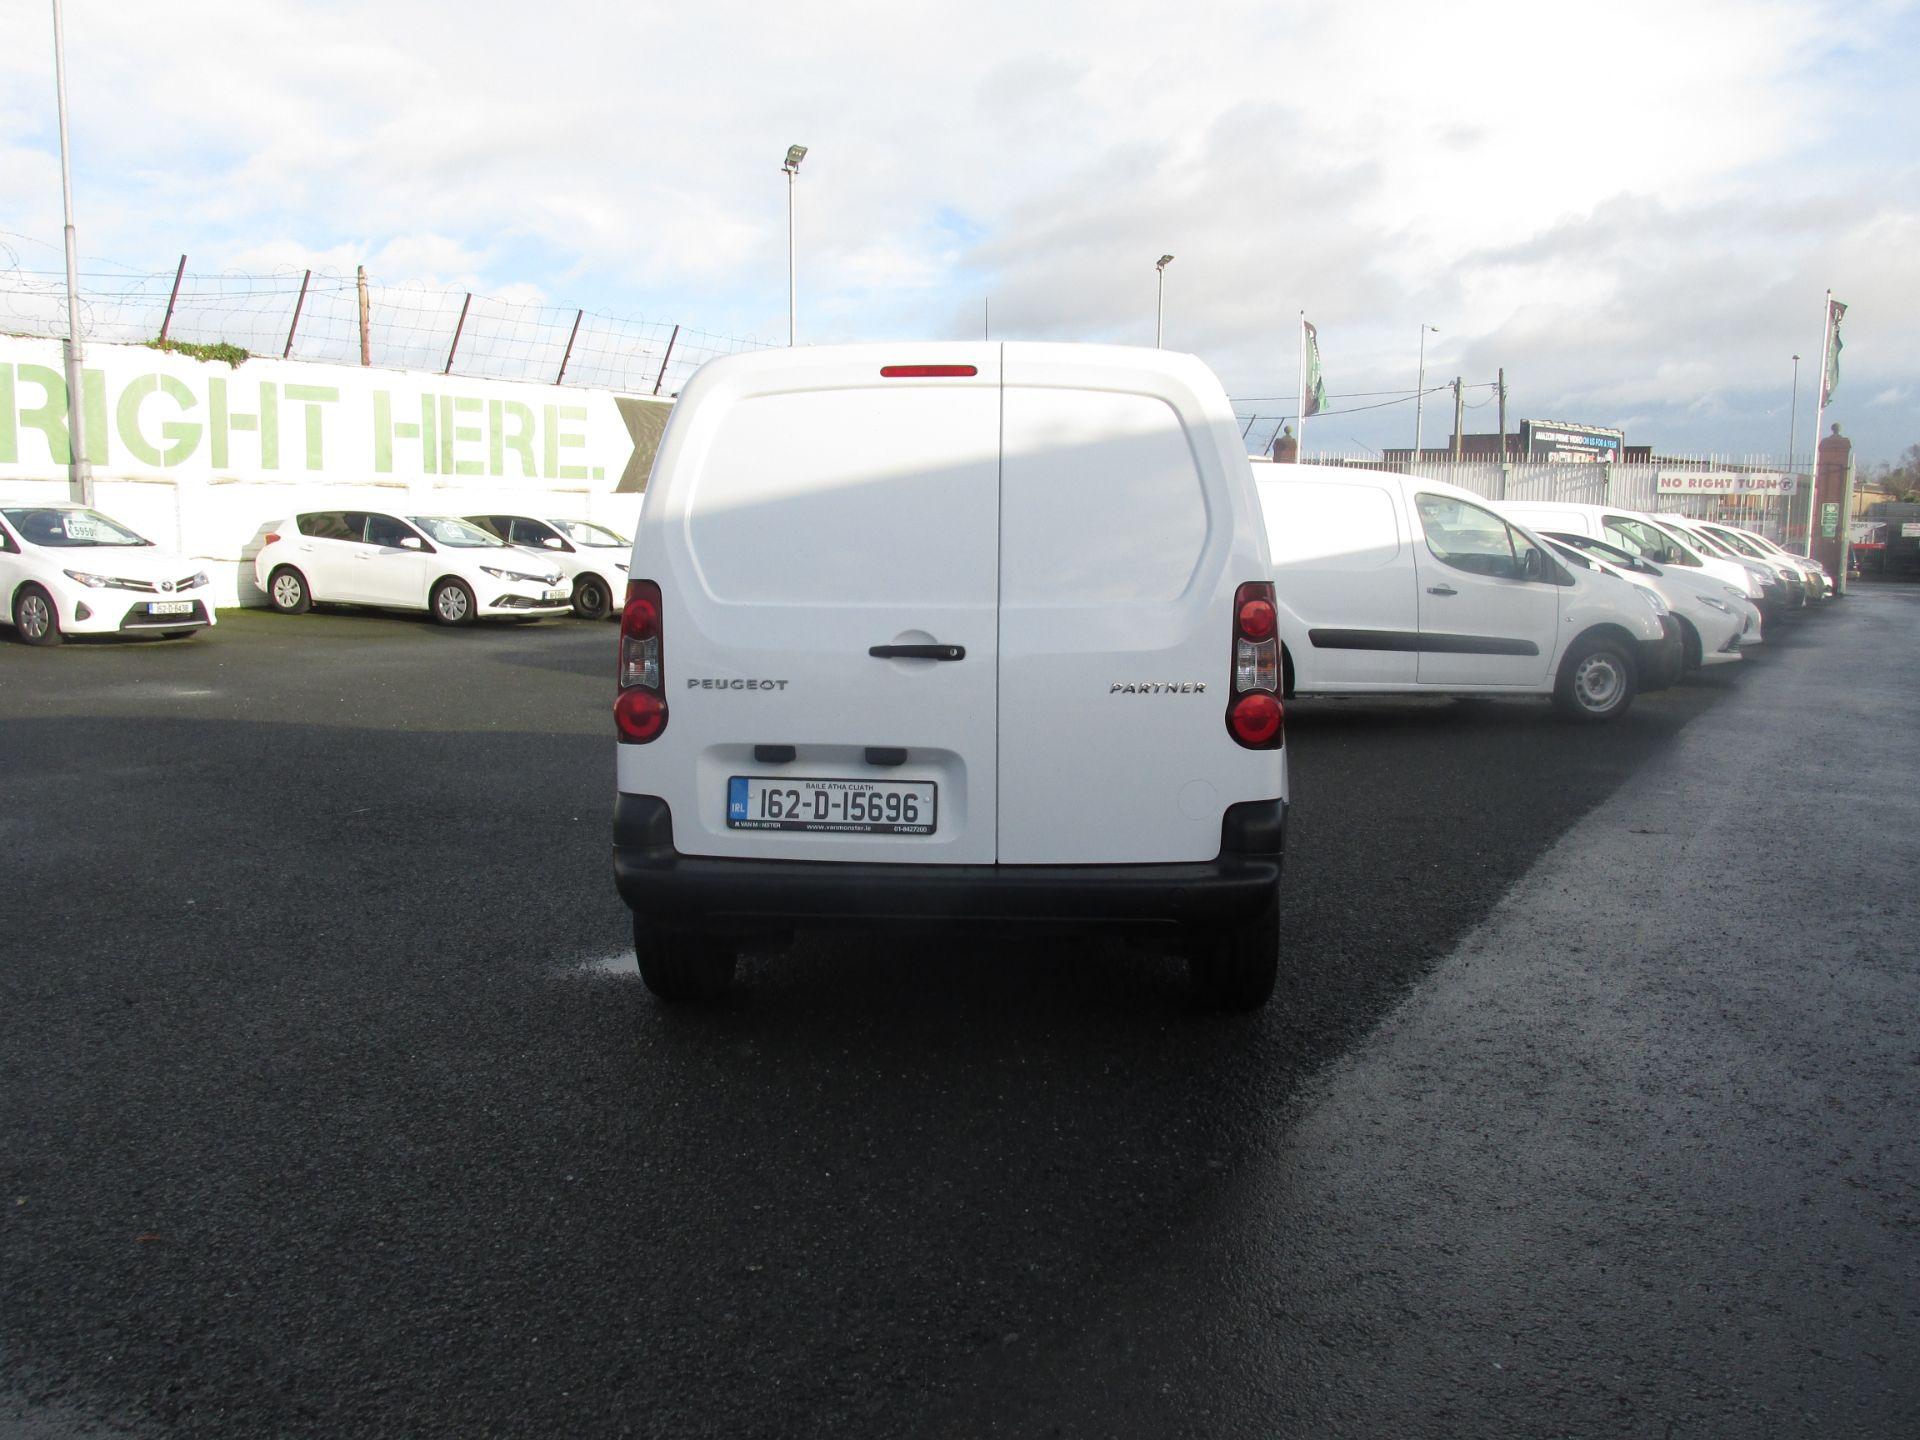 2016 Peugeot Partner Access 1.6 HDI 92 3DR (162D15696) Image 4